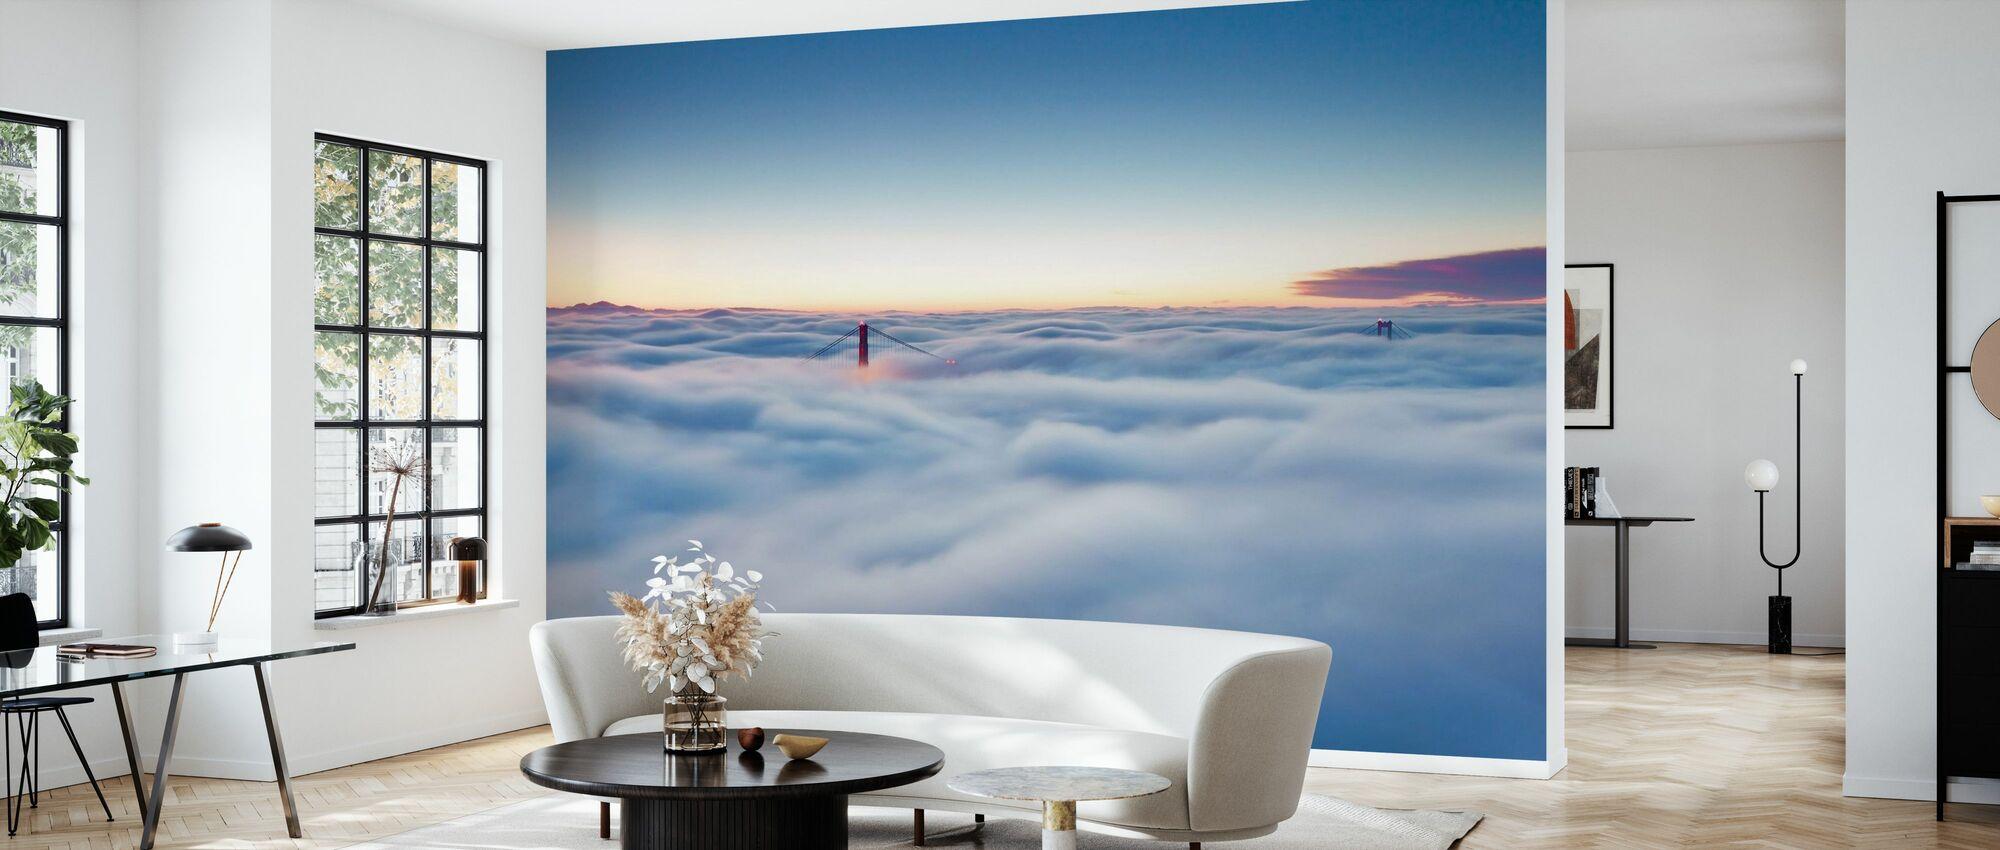 Fog over San Francisco - Wallpaper - Living Room